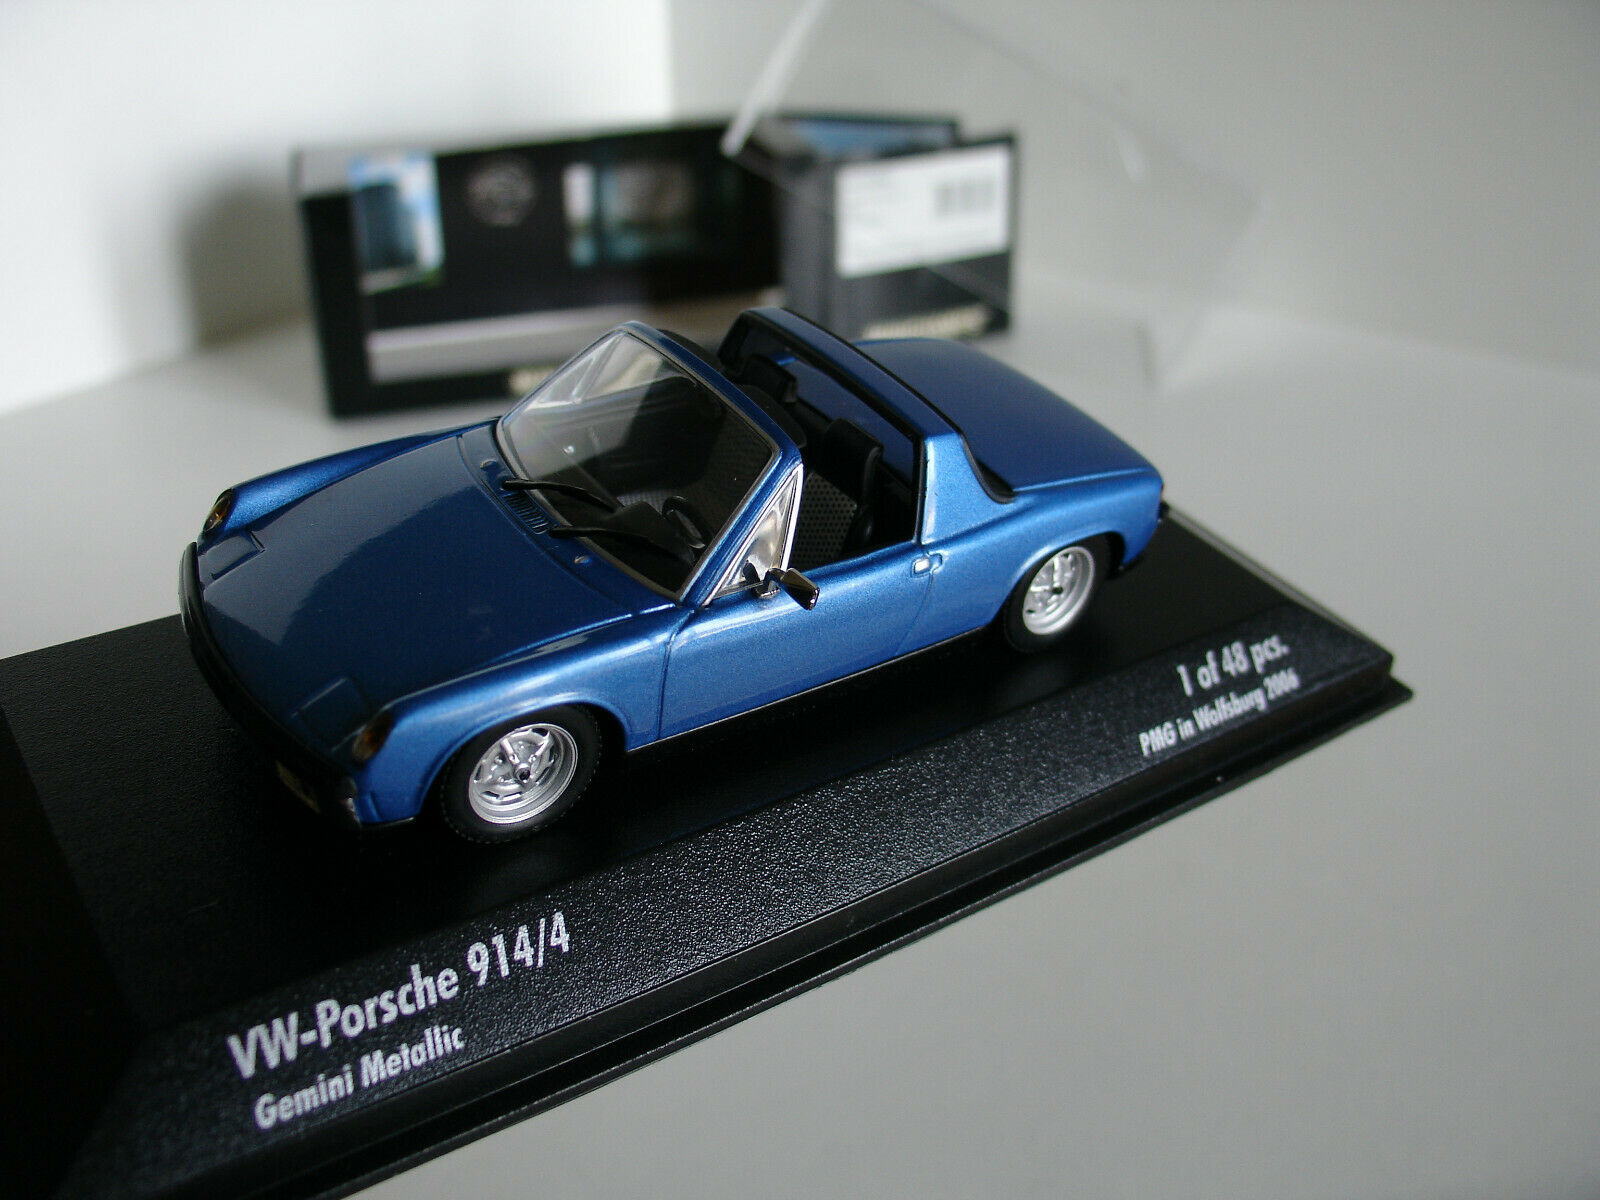 1 43 VW-PORSCHE 914 4 1973 PMG IN WOLFSBURG 2006 L.E 48 pcs by MINICHAMPS